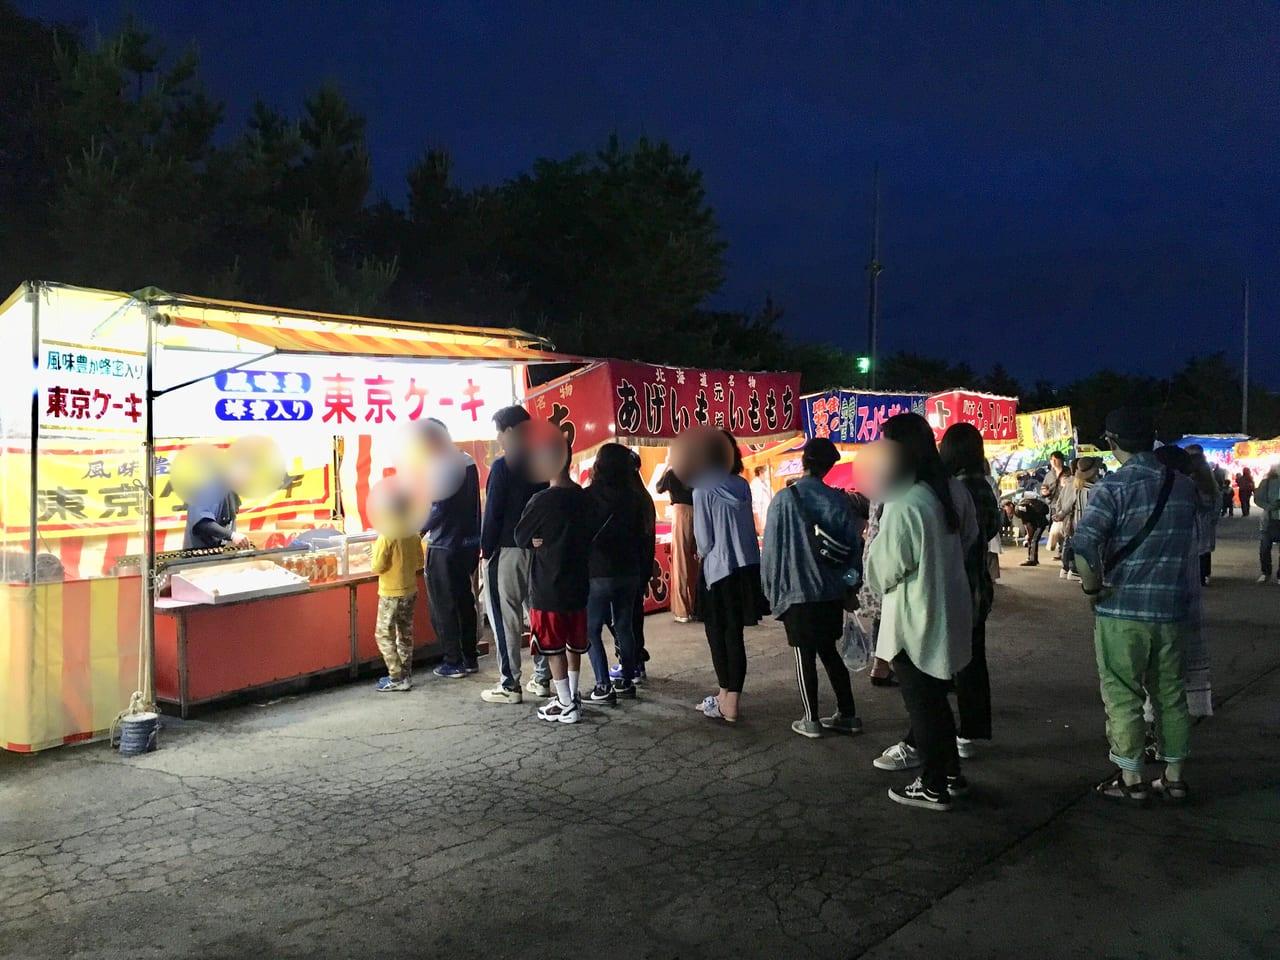 苫小牧総鎮守 樽前山神社例大祭の出店に並ぶ人々